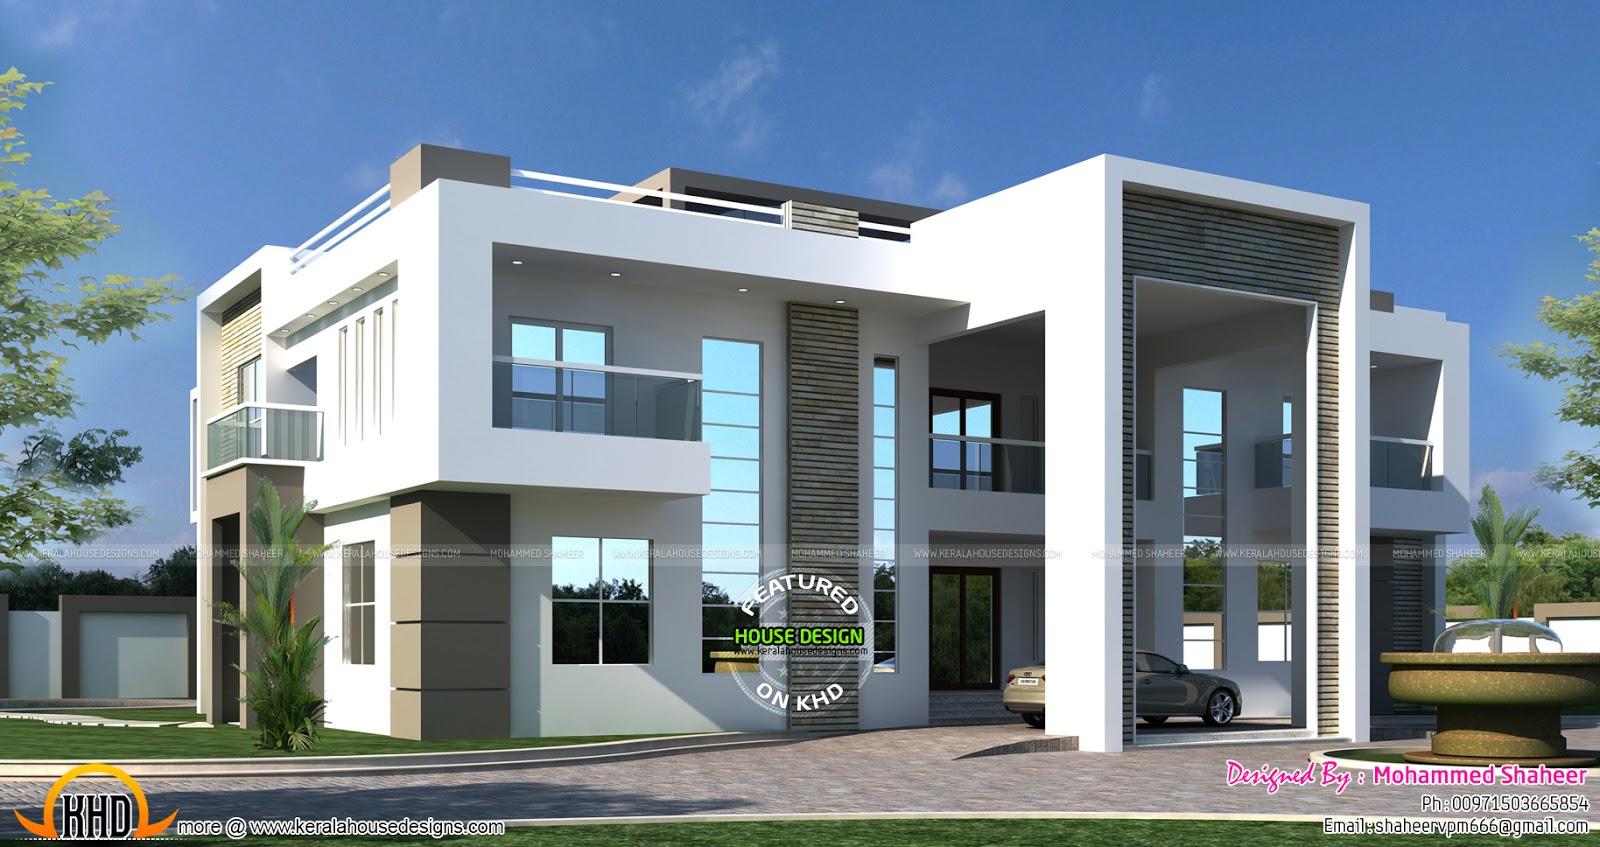 Flat roof Arabian house plan - Kerala home design and ...